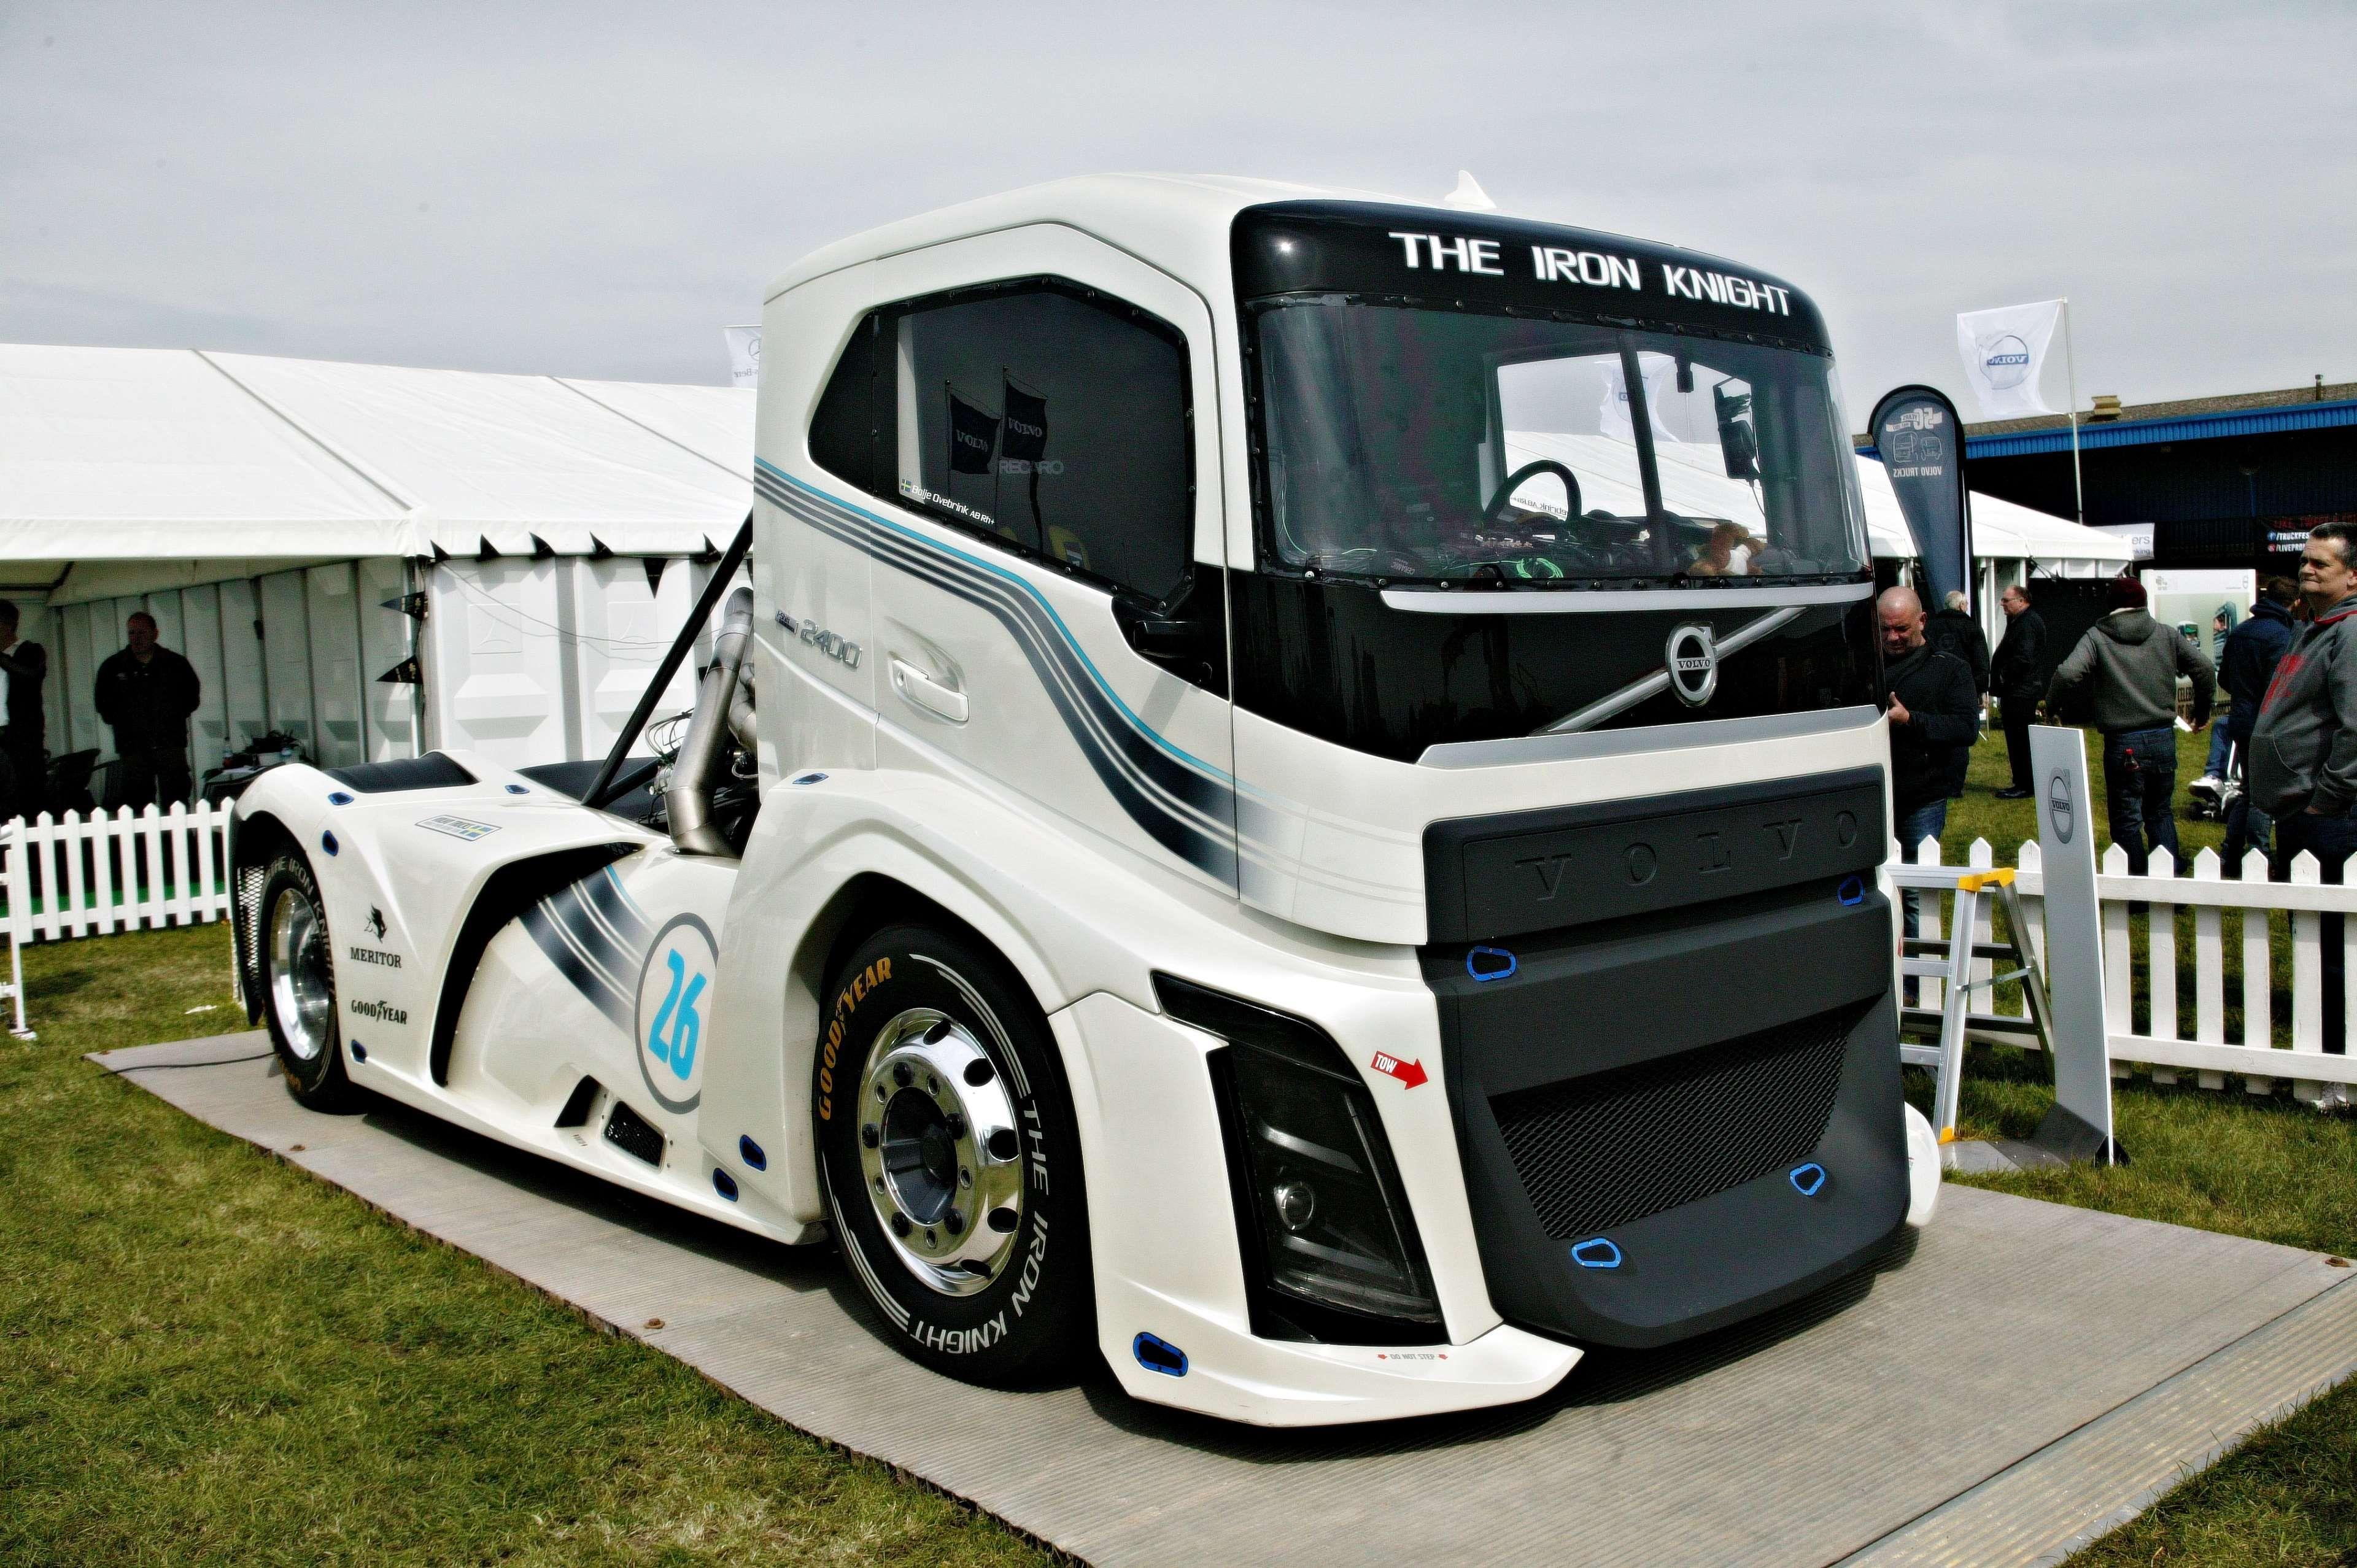 Filename The Iron Knight Truck Volvo 4k Wallpaper Resolution 3840x2555 File Size 948 Kb Uploaded Date 2018 01 1 Volvo Trucks Truck Design Volvo